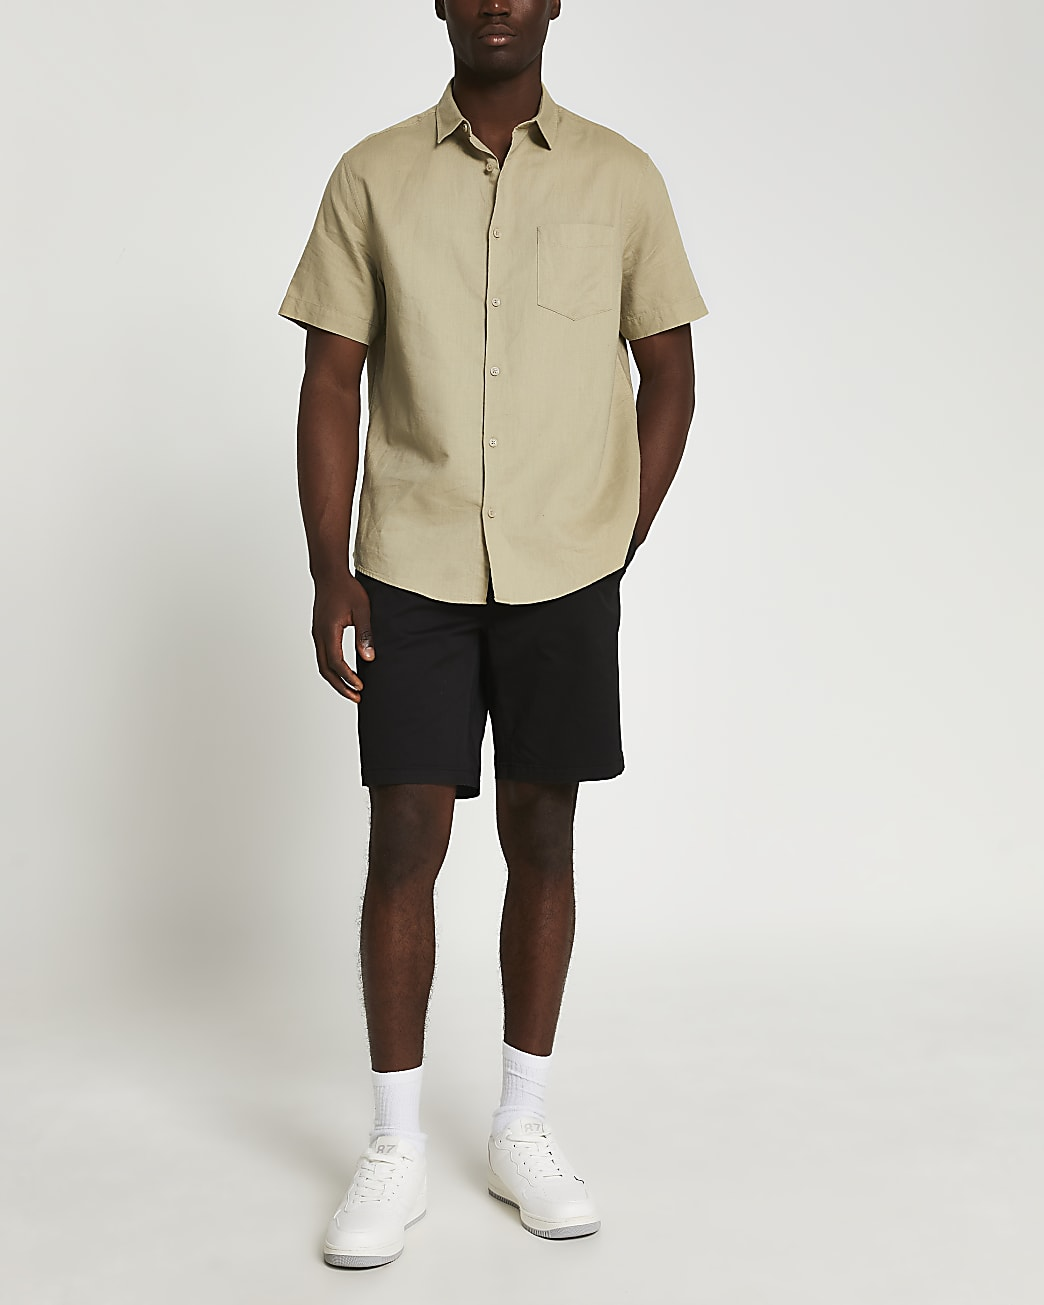 Black washed slim fit chino shorts